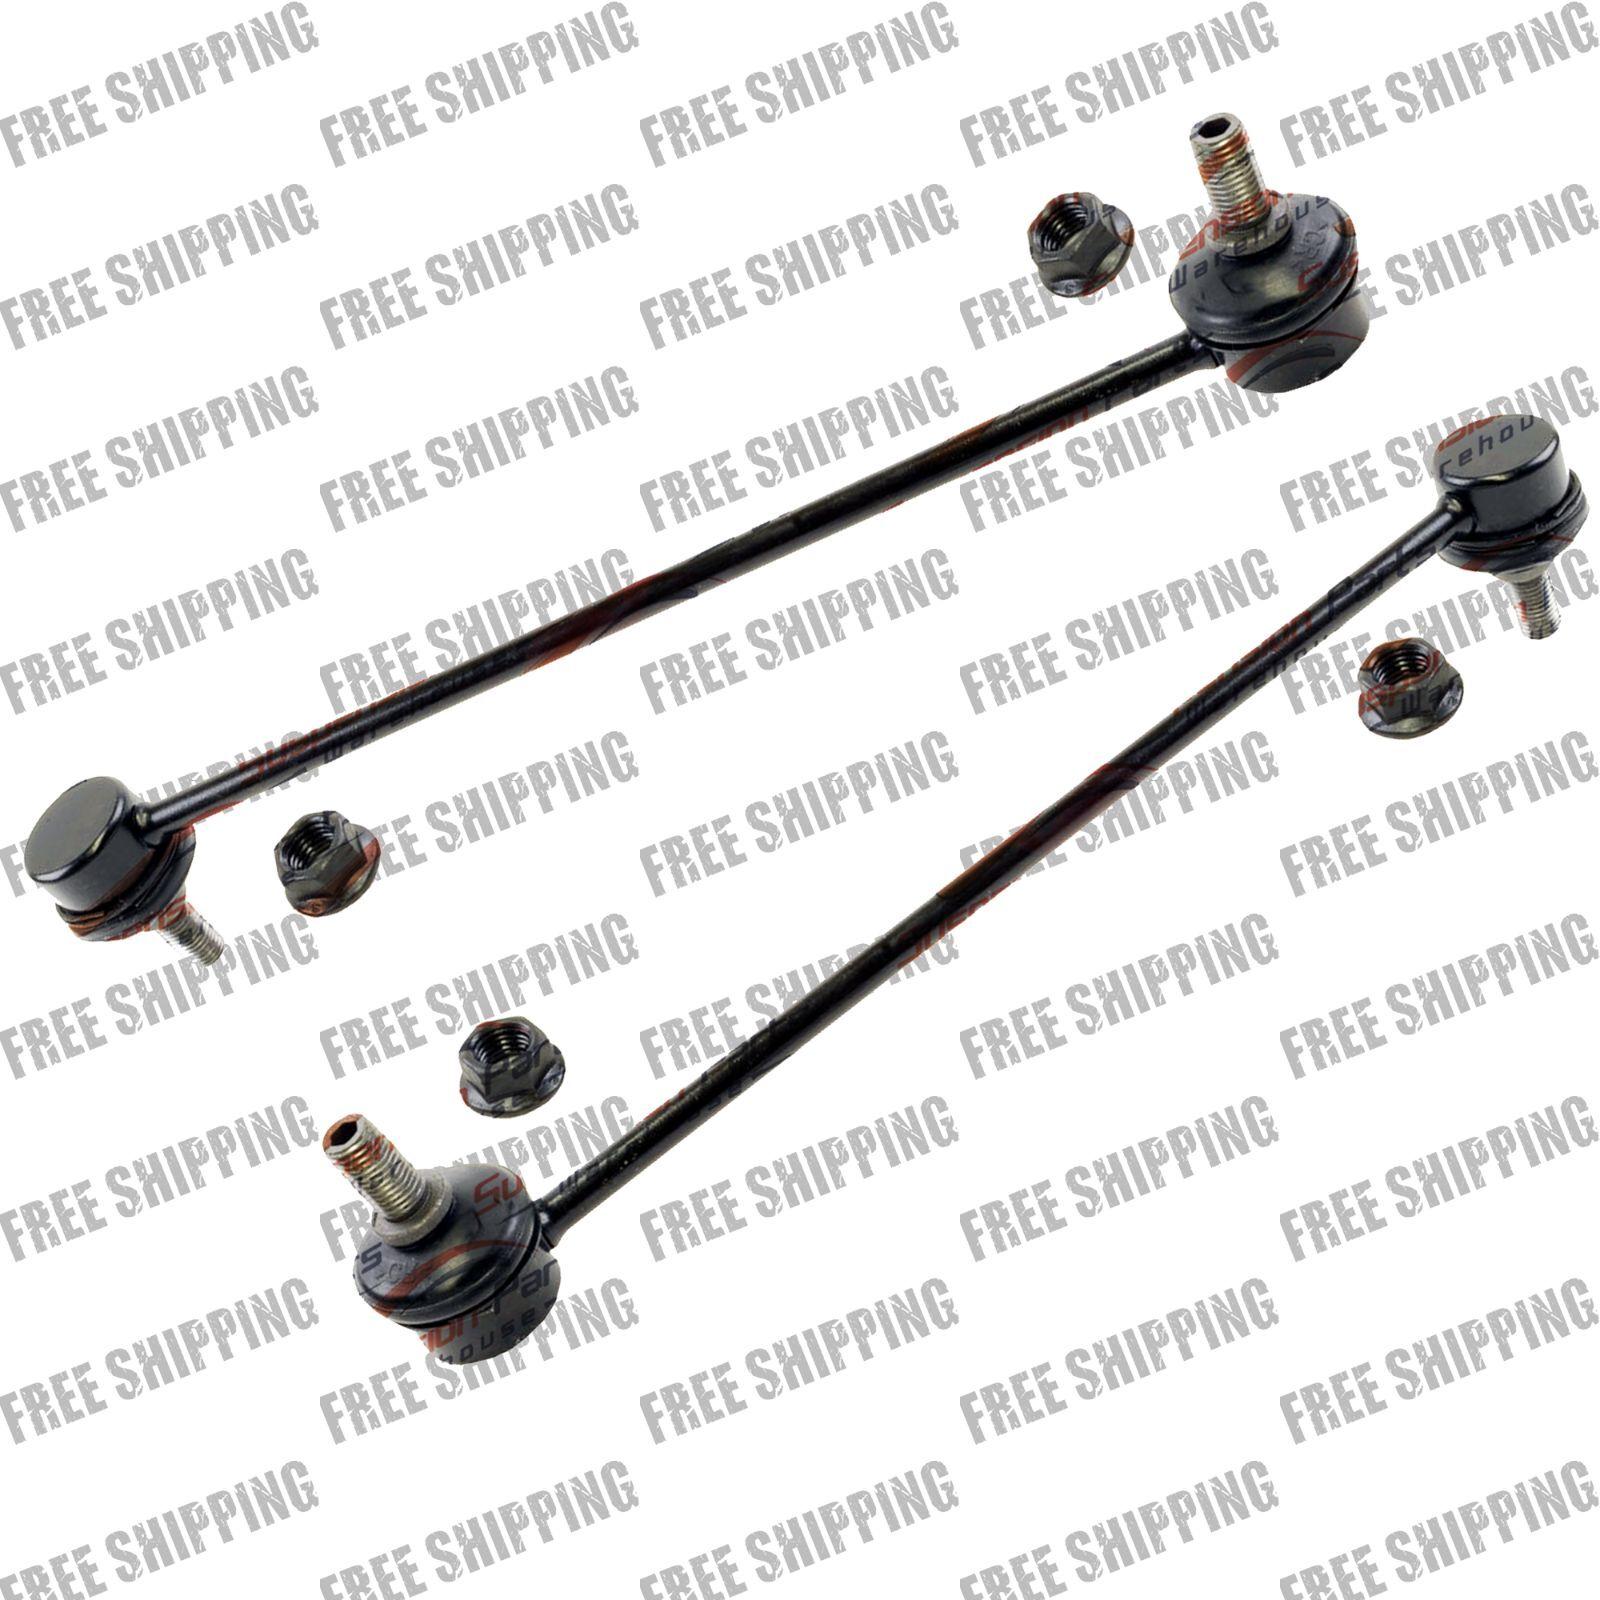 2 Stabilizer Sway Bar Mazda Mpv Protege 5 Dodge Caliber